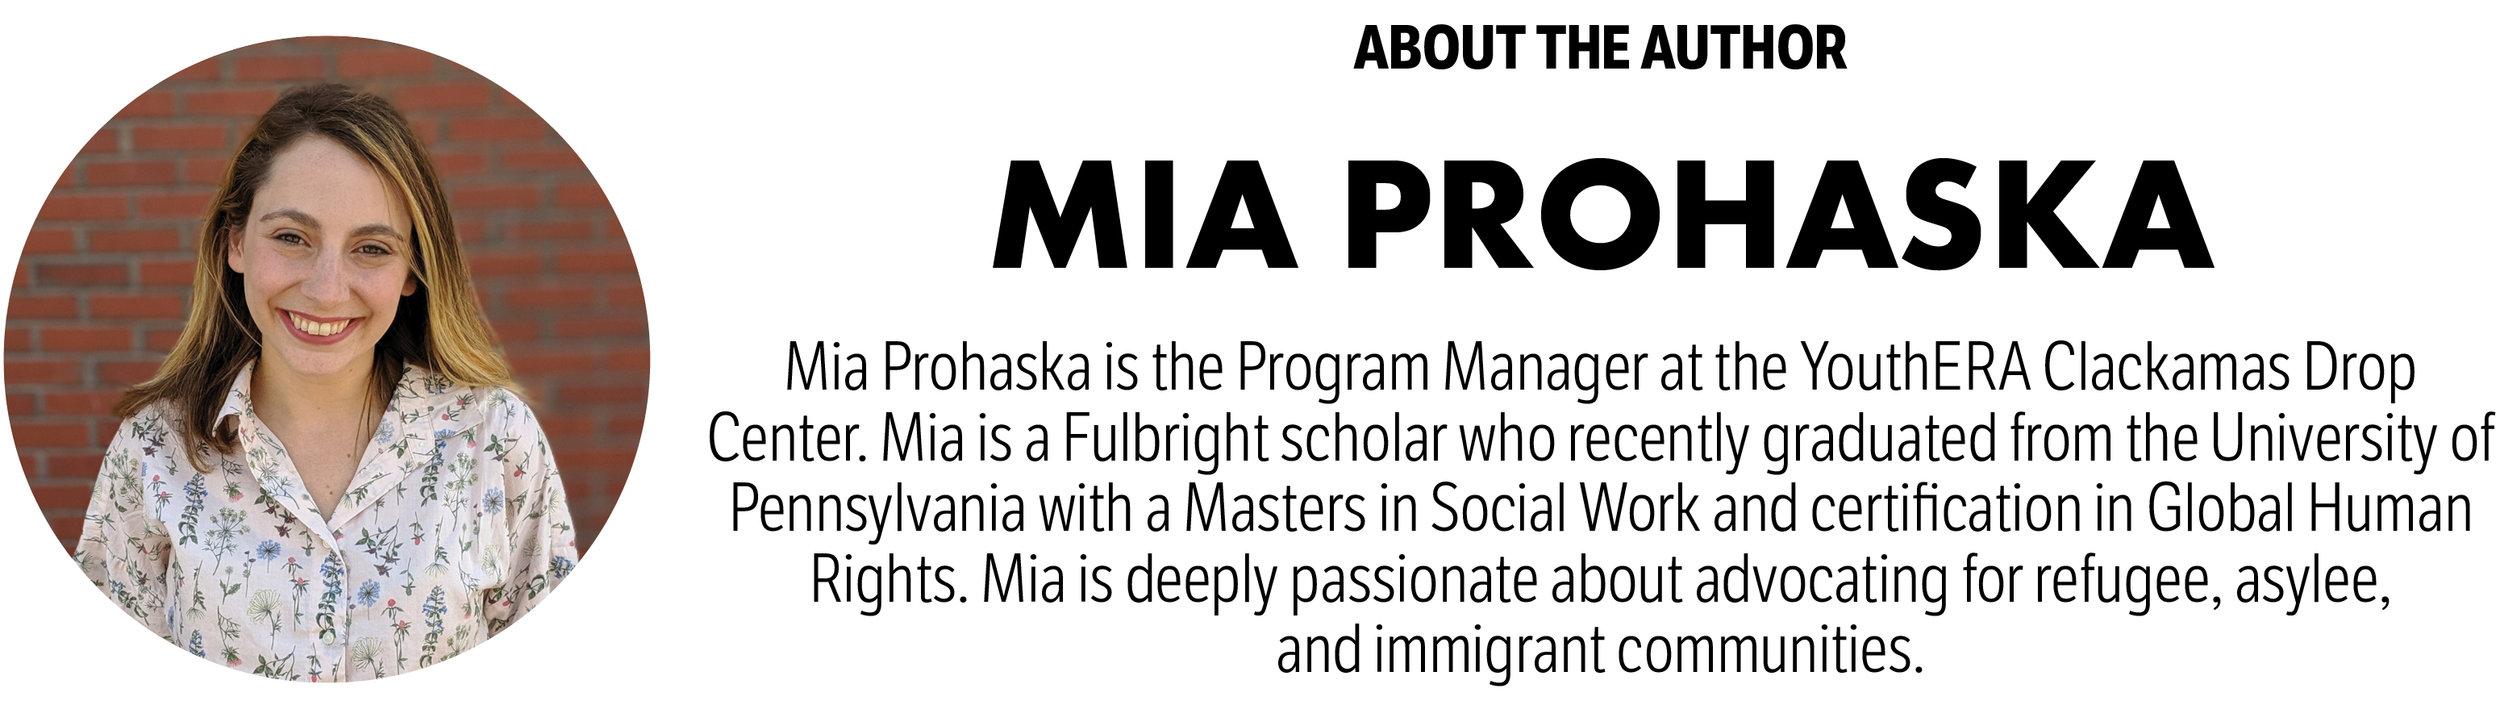 Mia Prohaska Author Profile.jpg